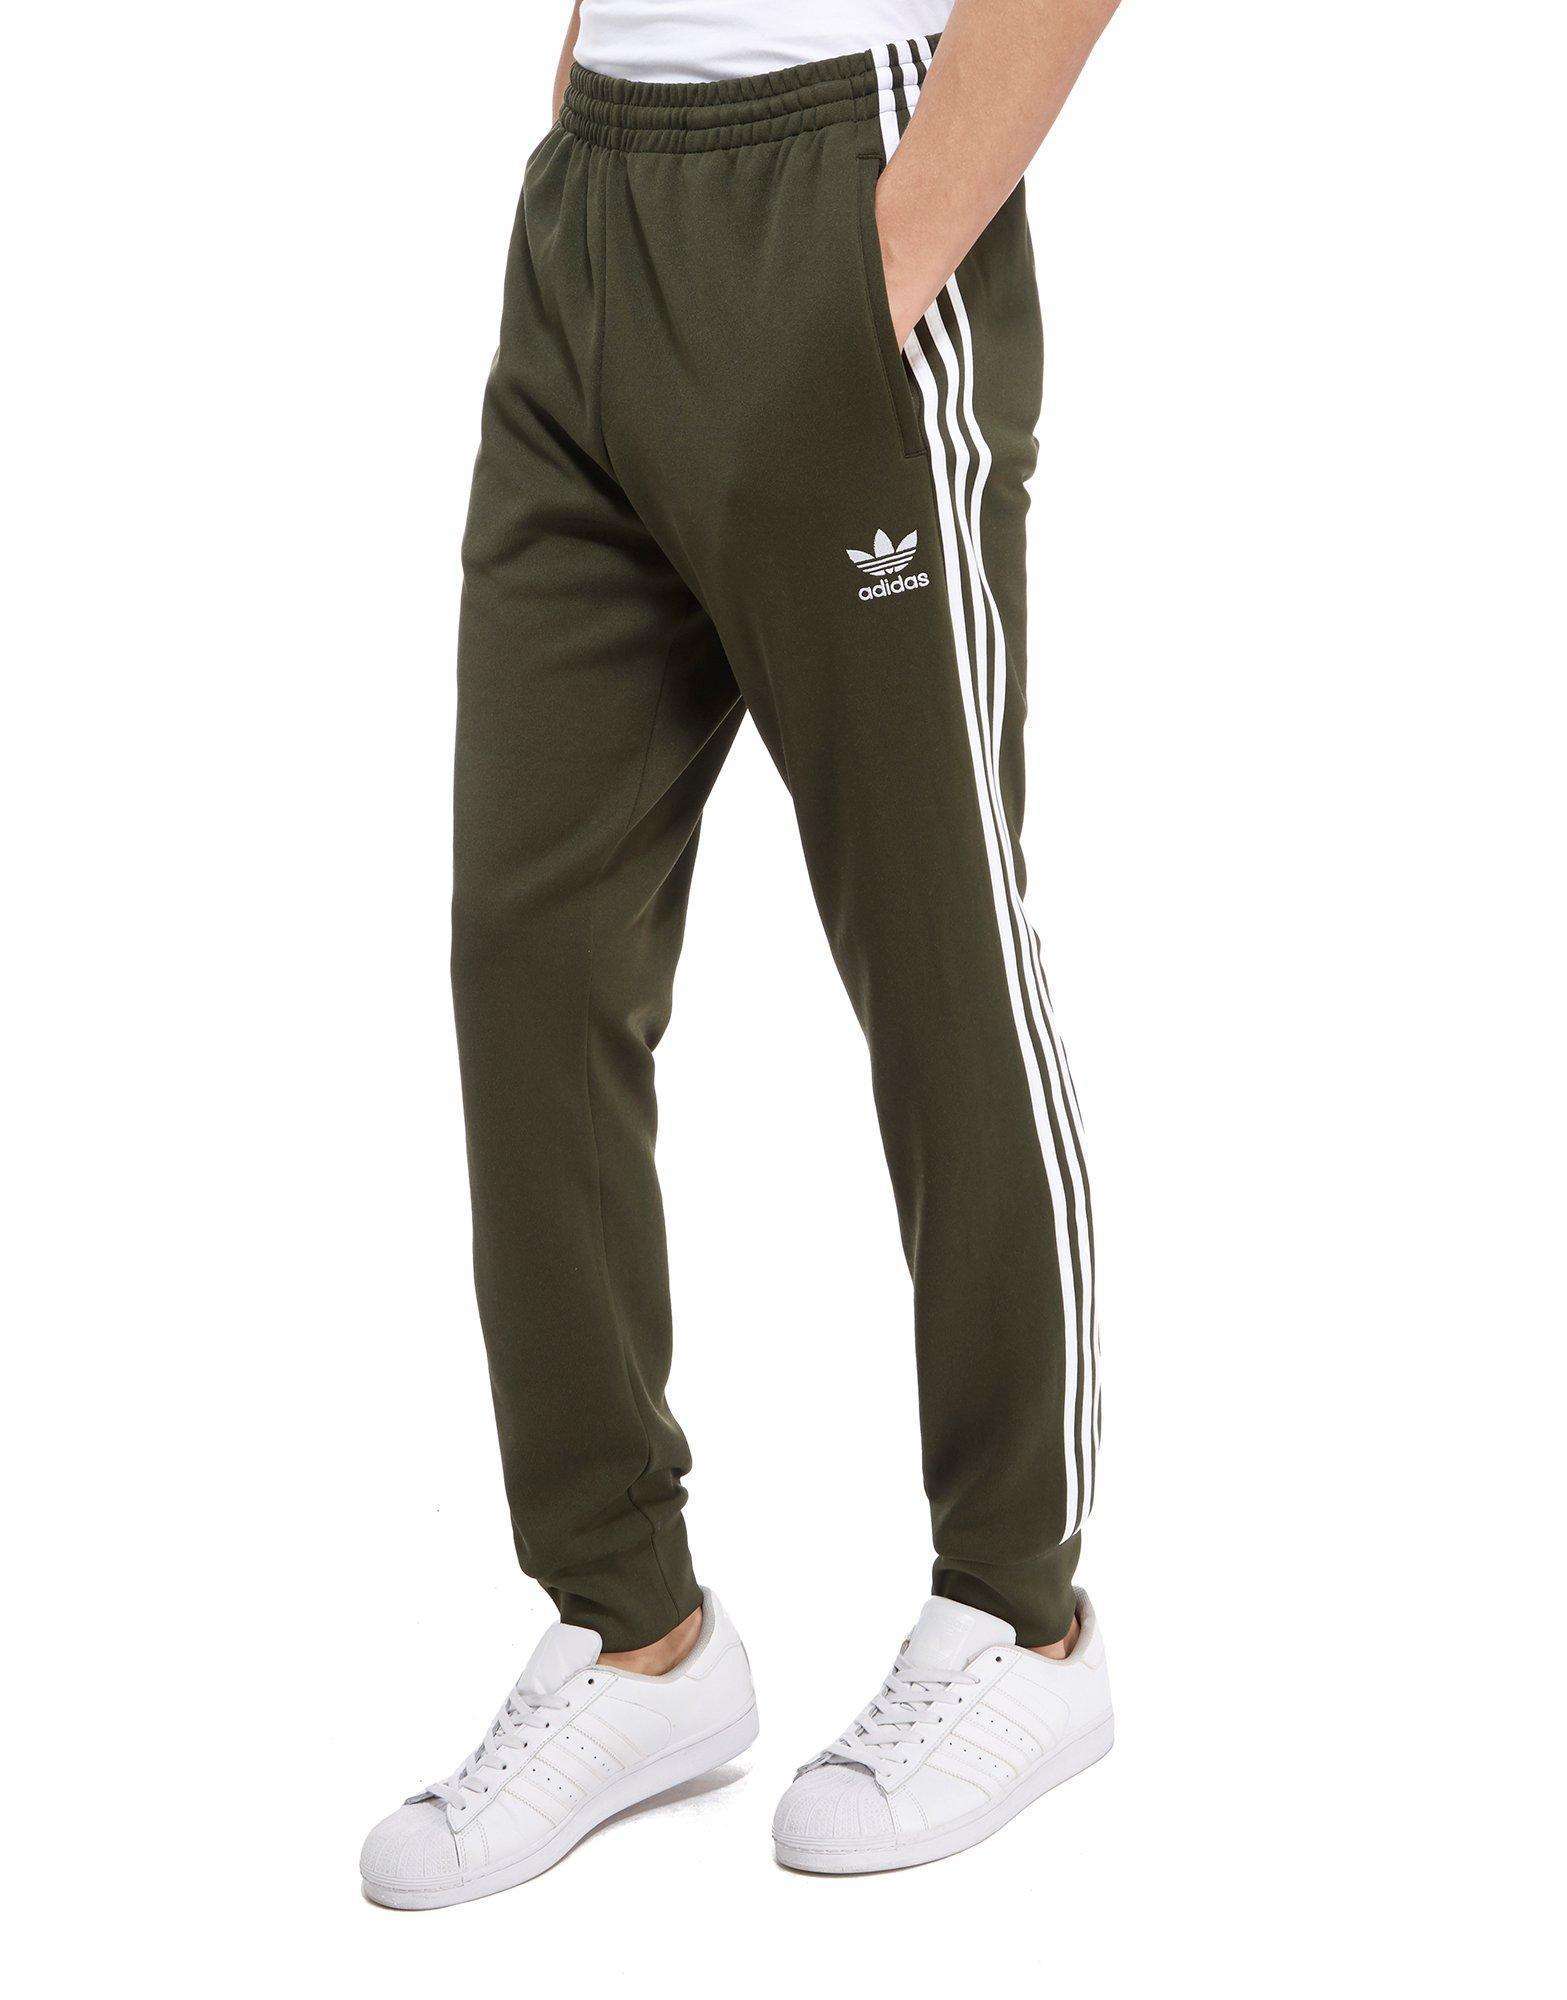 Boutique Adidas Originals For Men Green Shorts Adidas Night